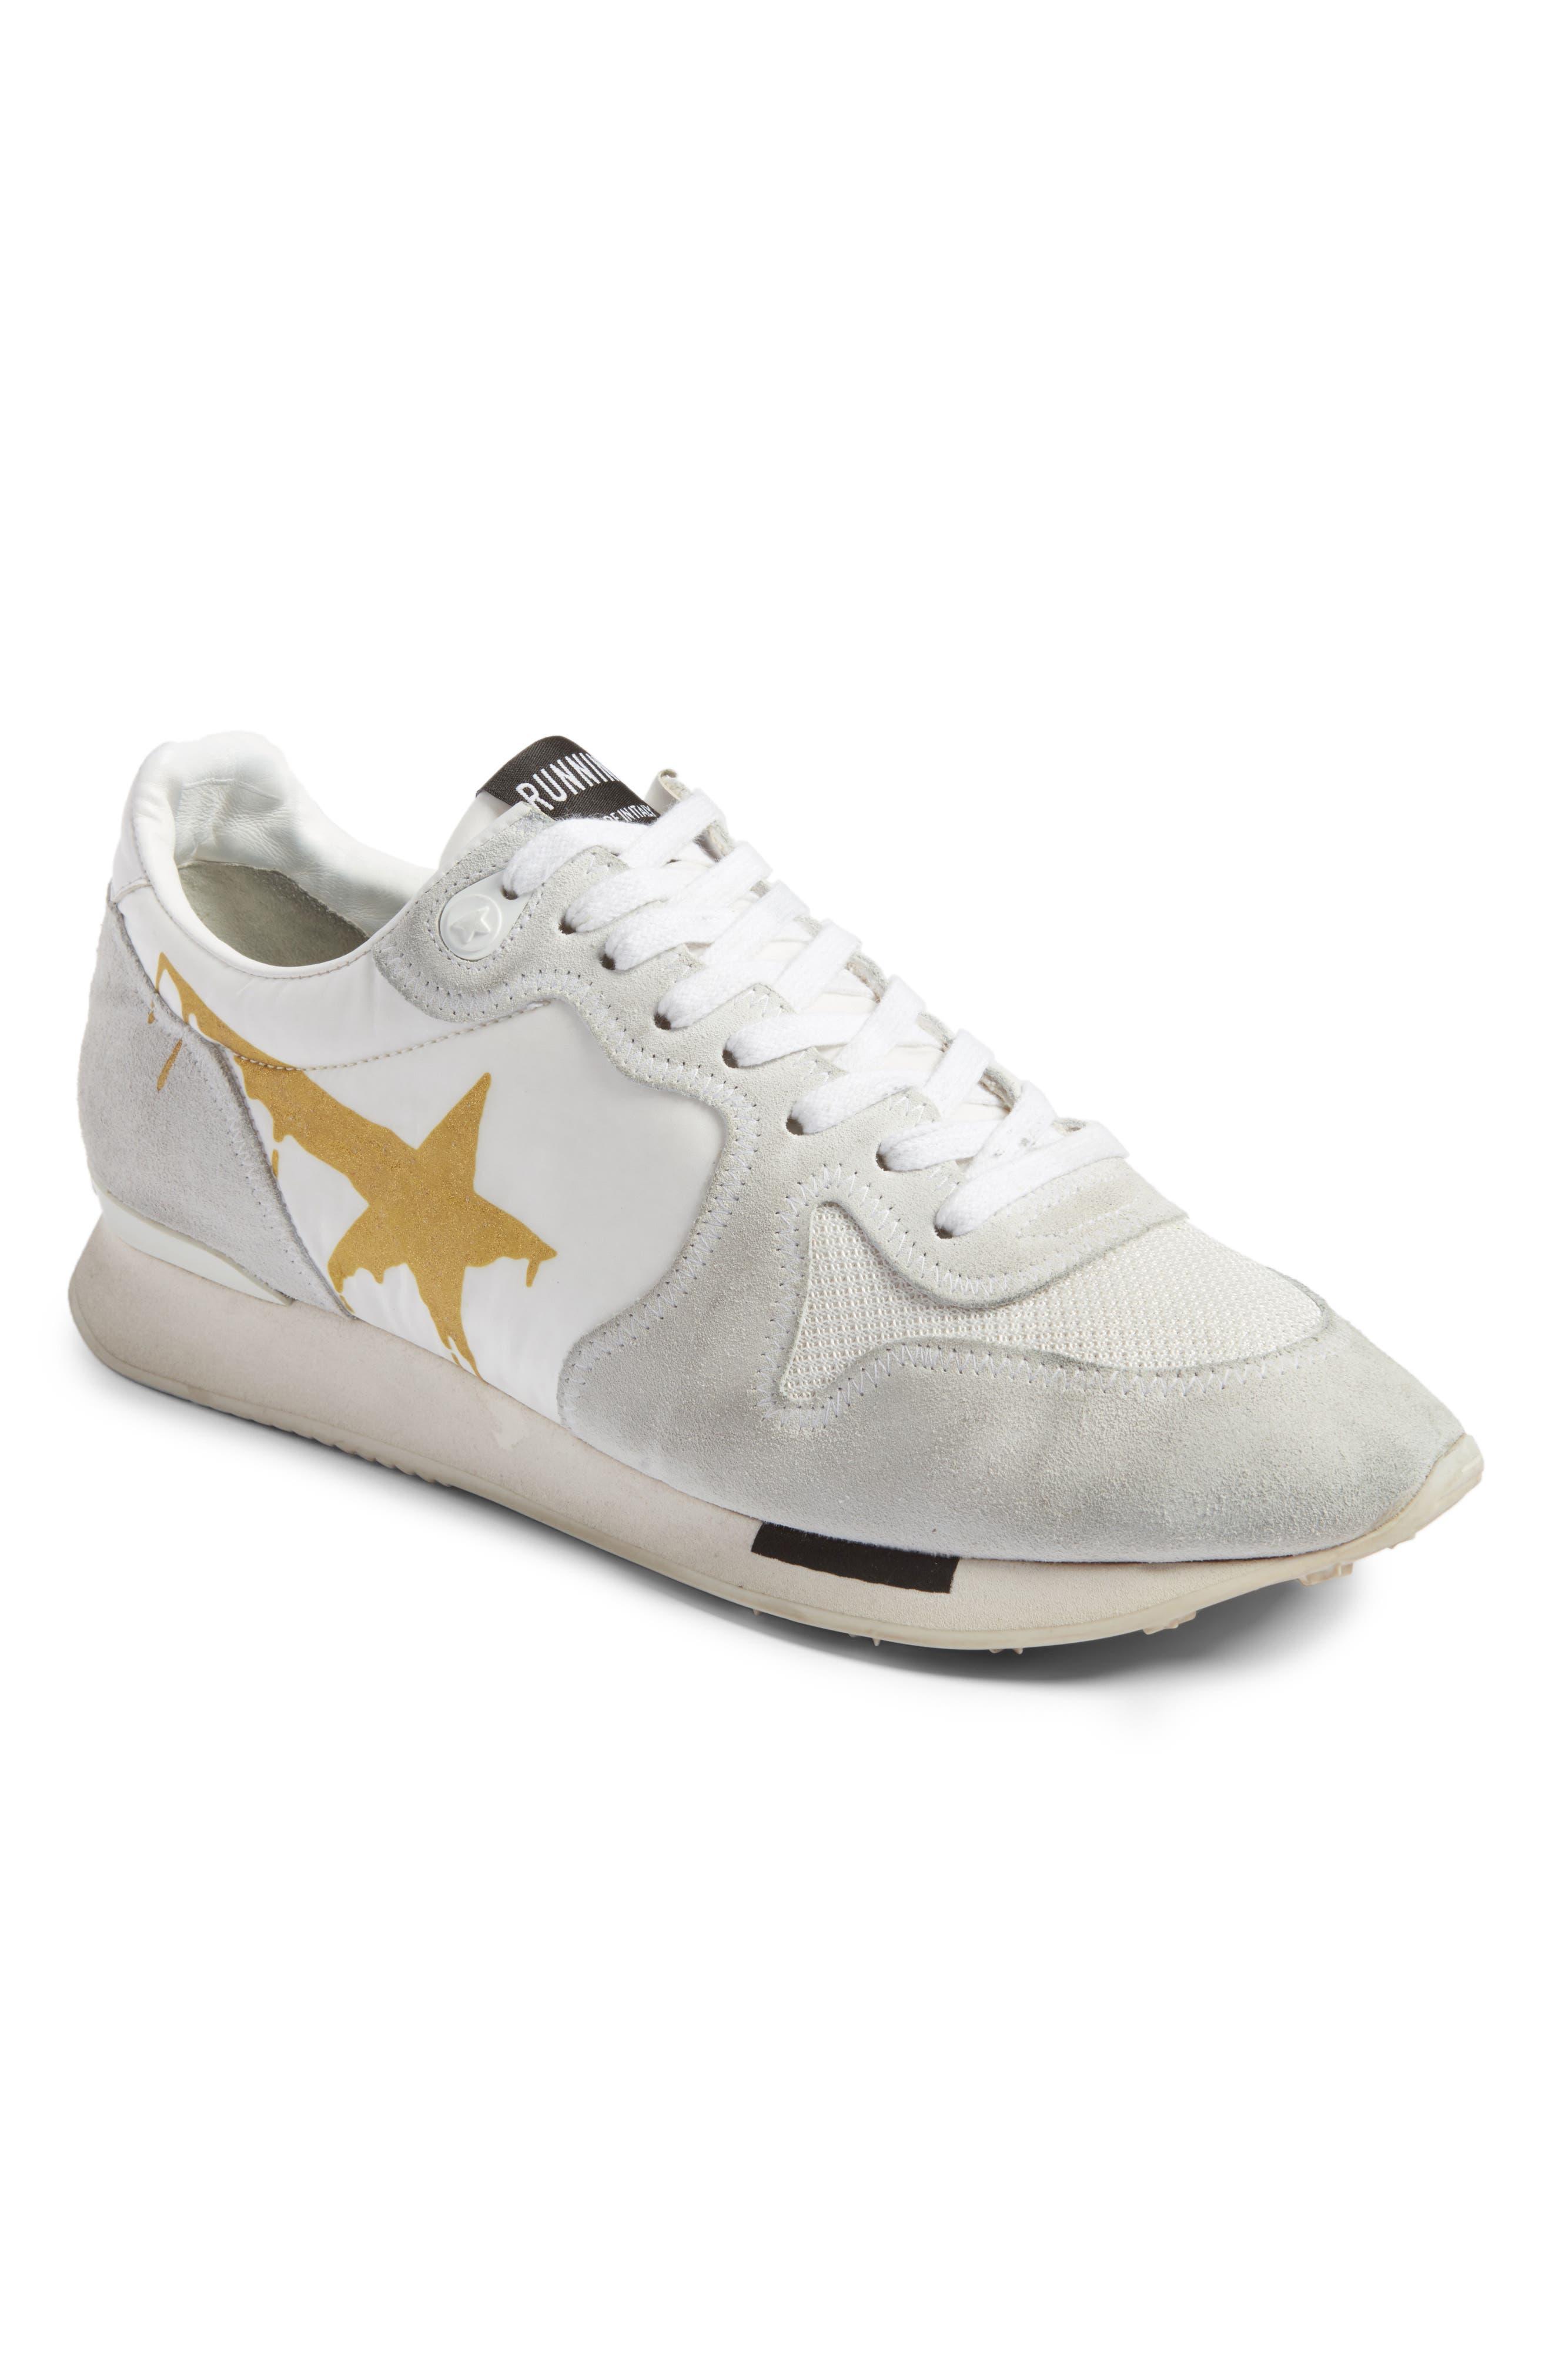 Running Trainer Sneaker,                         Main,                         color,